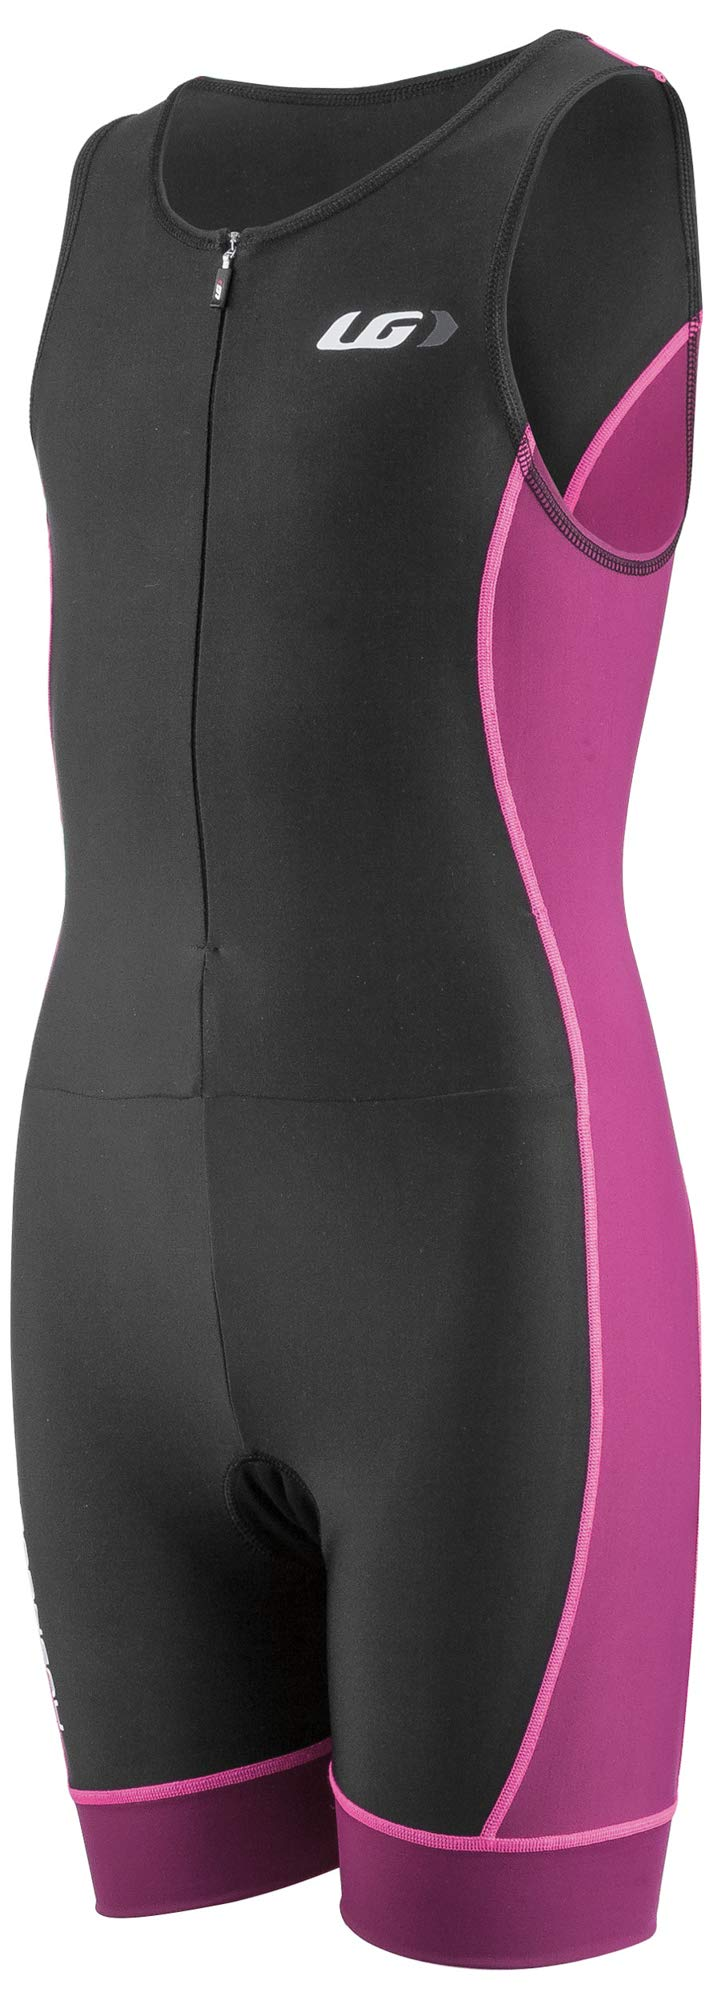 Louis Garneau Kids Comp 2 Sleeveless, Padded Triathlon Cycling Suit, Magenta Purple, Junior X-Small